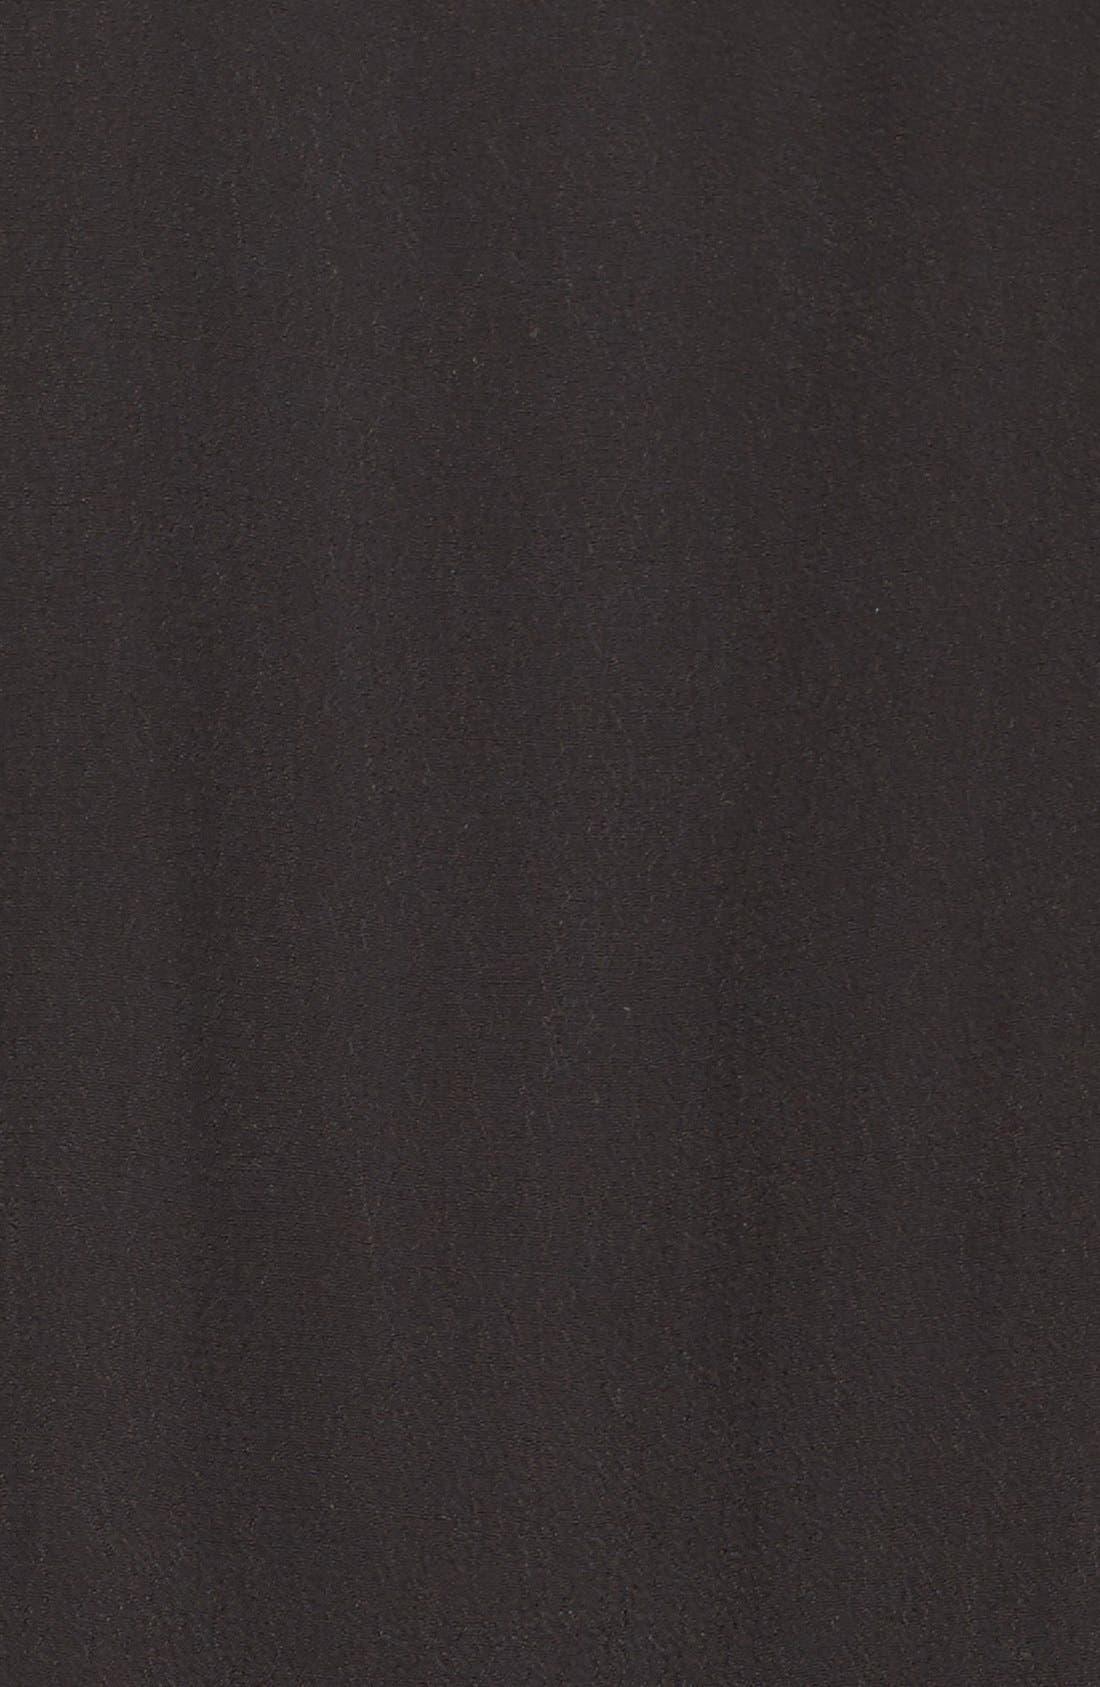 Off the Shoulder Jumpsuit,                             Alternate thumbnail 2, color,                             BLACK